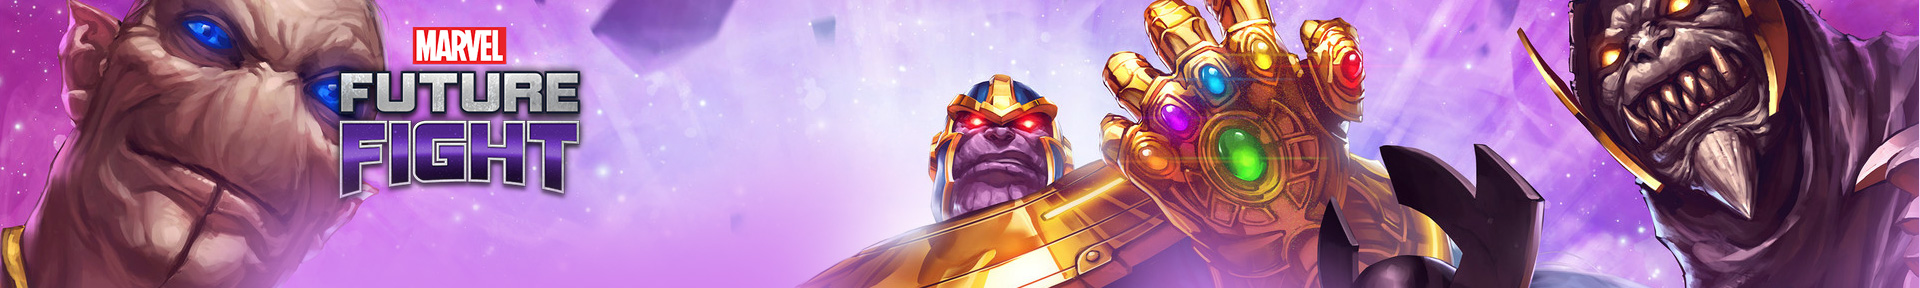 Marvel: Future Fight Crystals